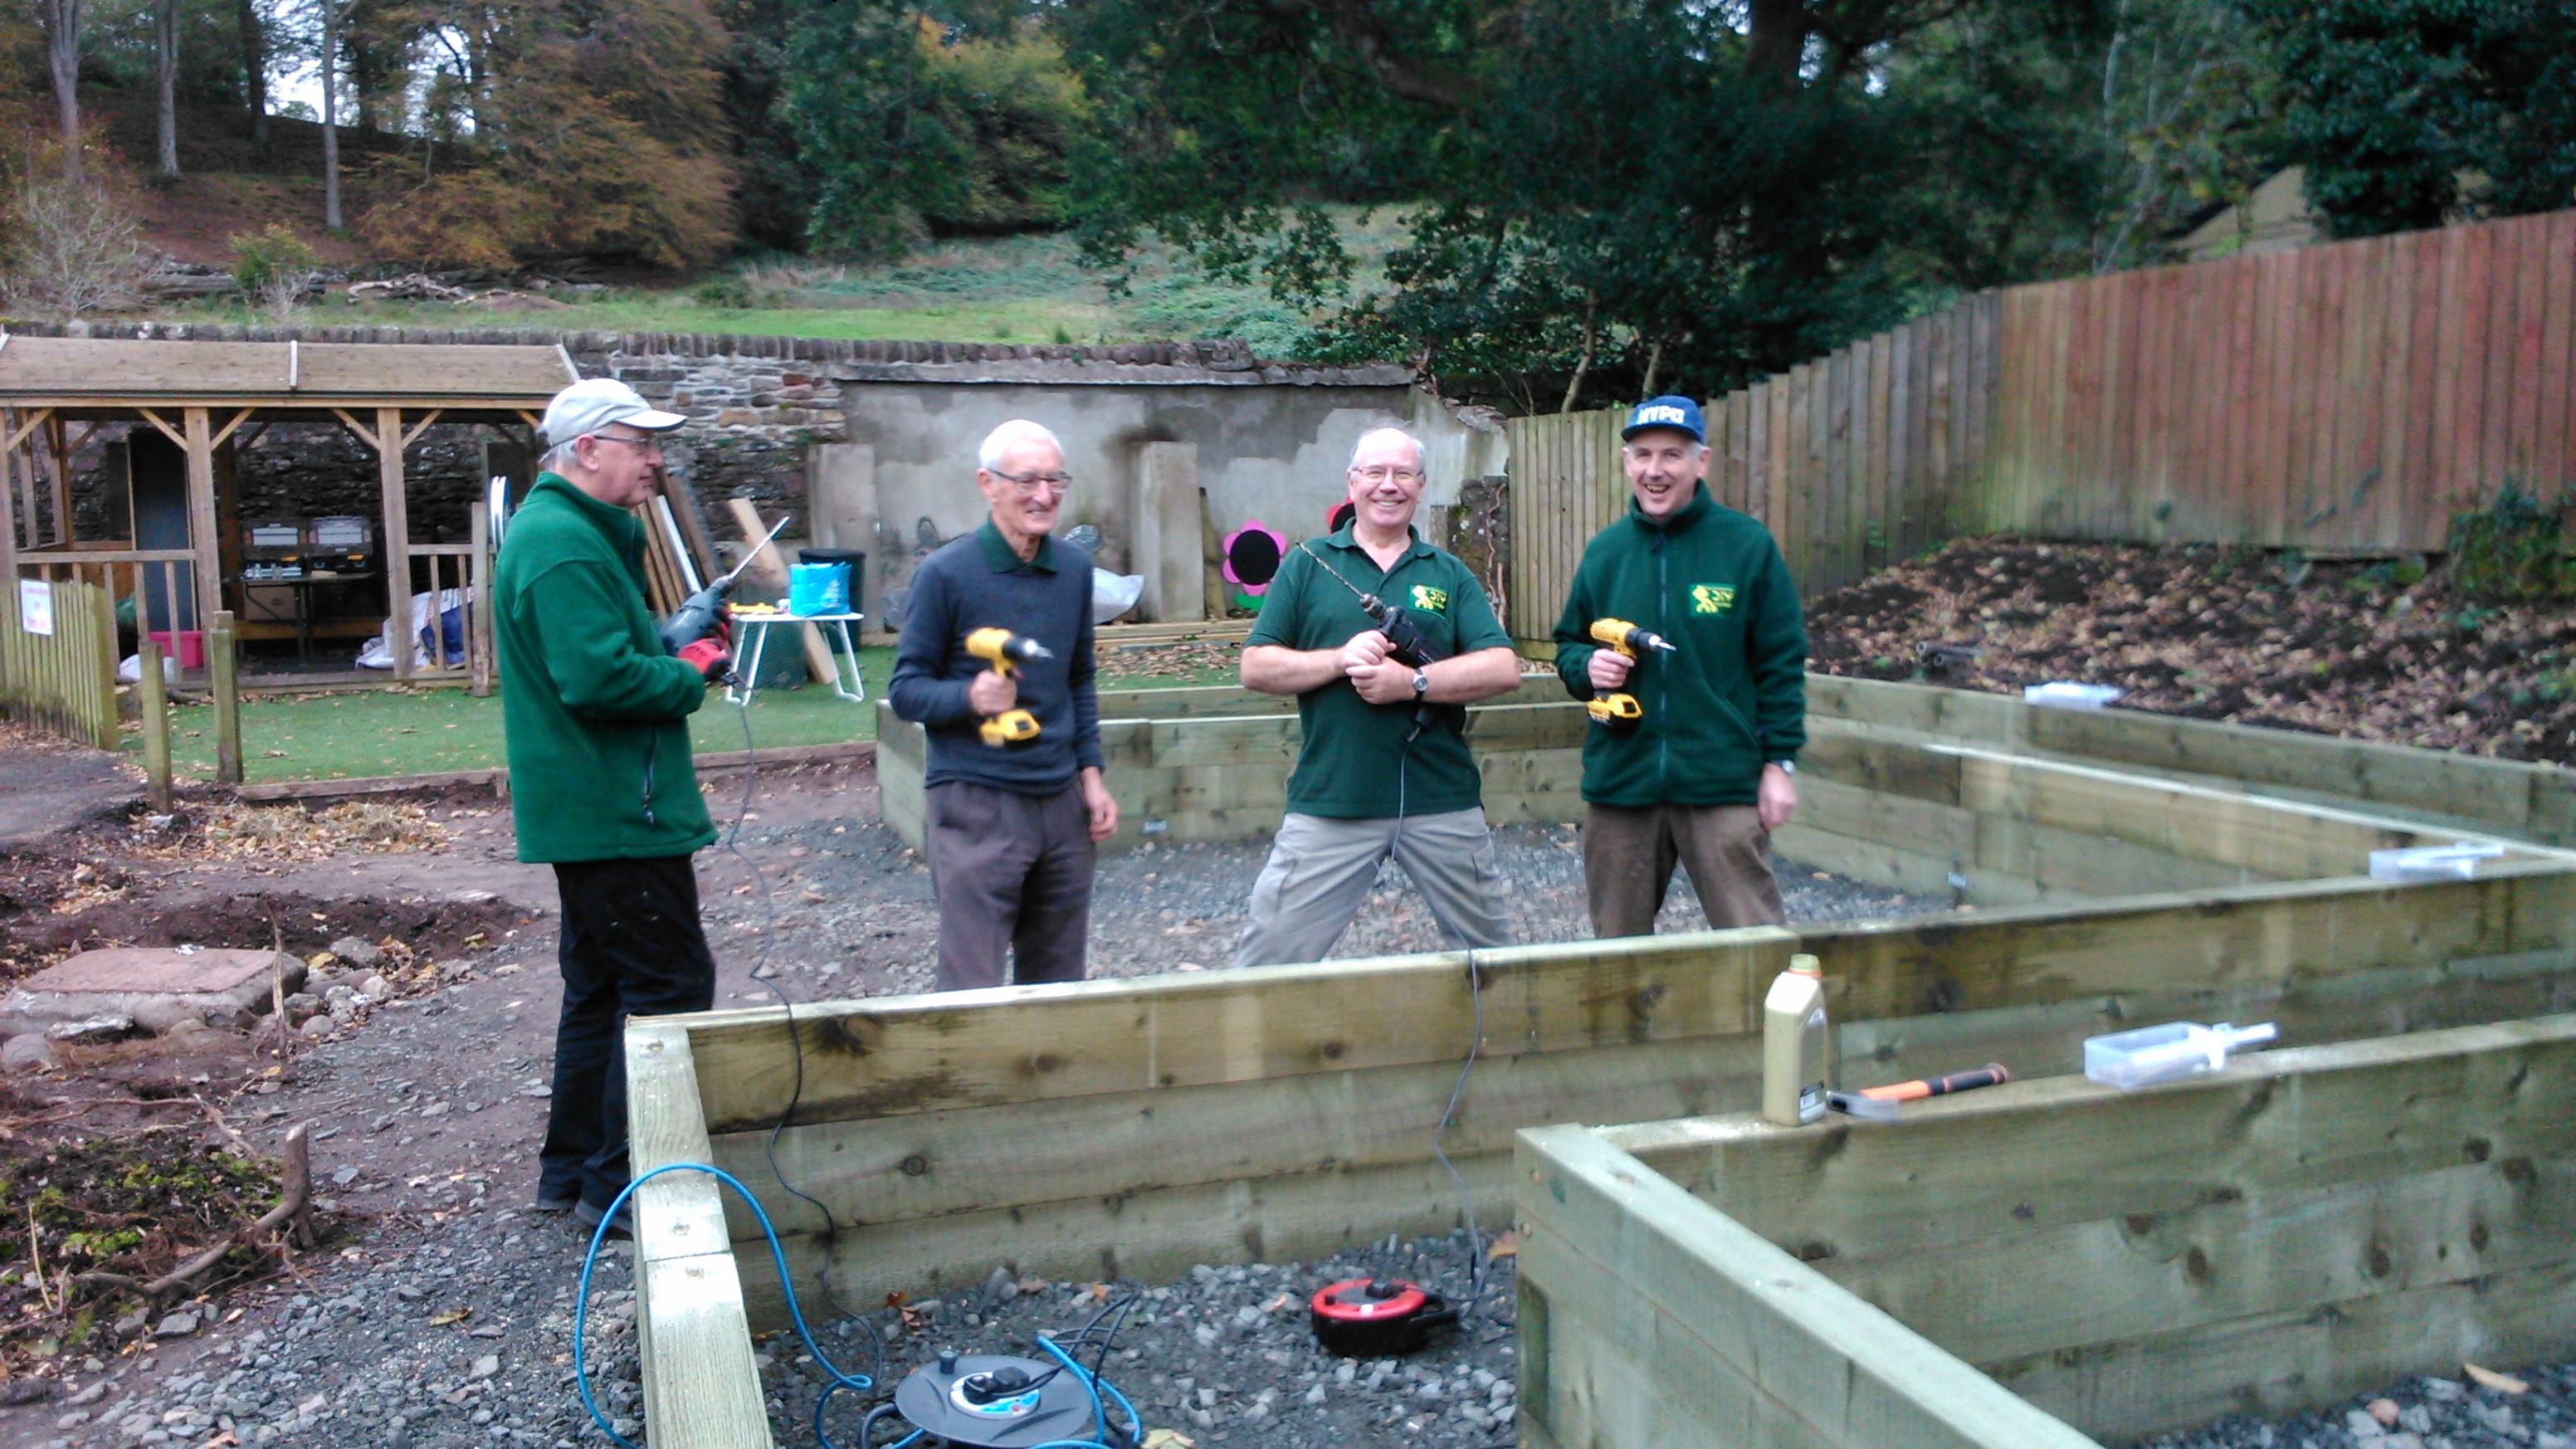 Dementia Friendly Braeport Garden Appeal by Dunblane Development Trust fundraising photo 3